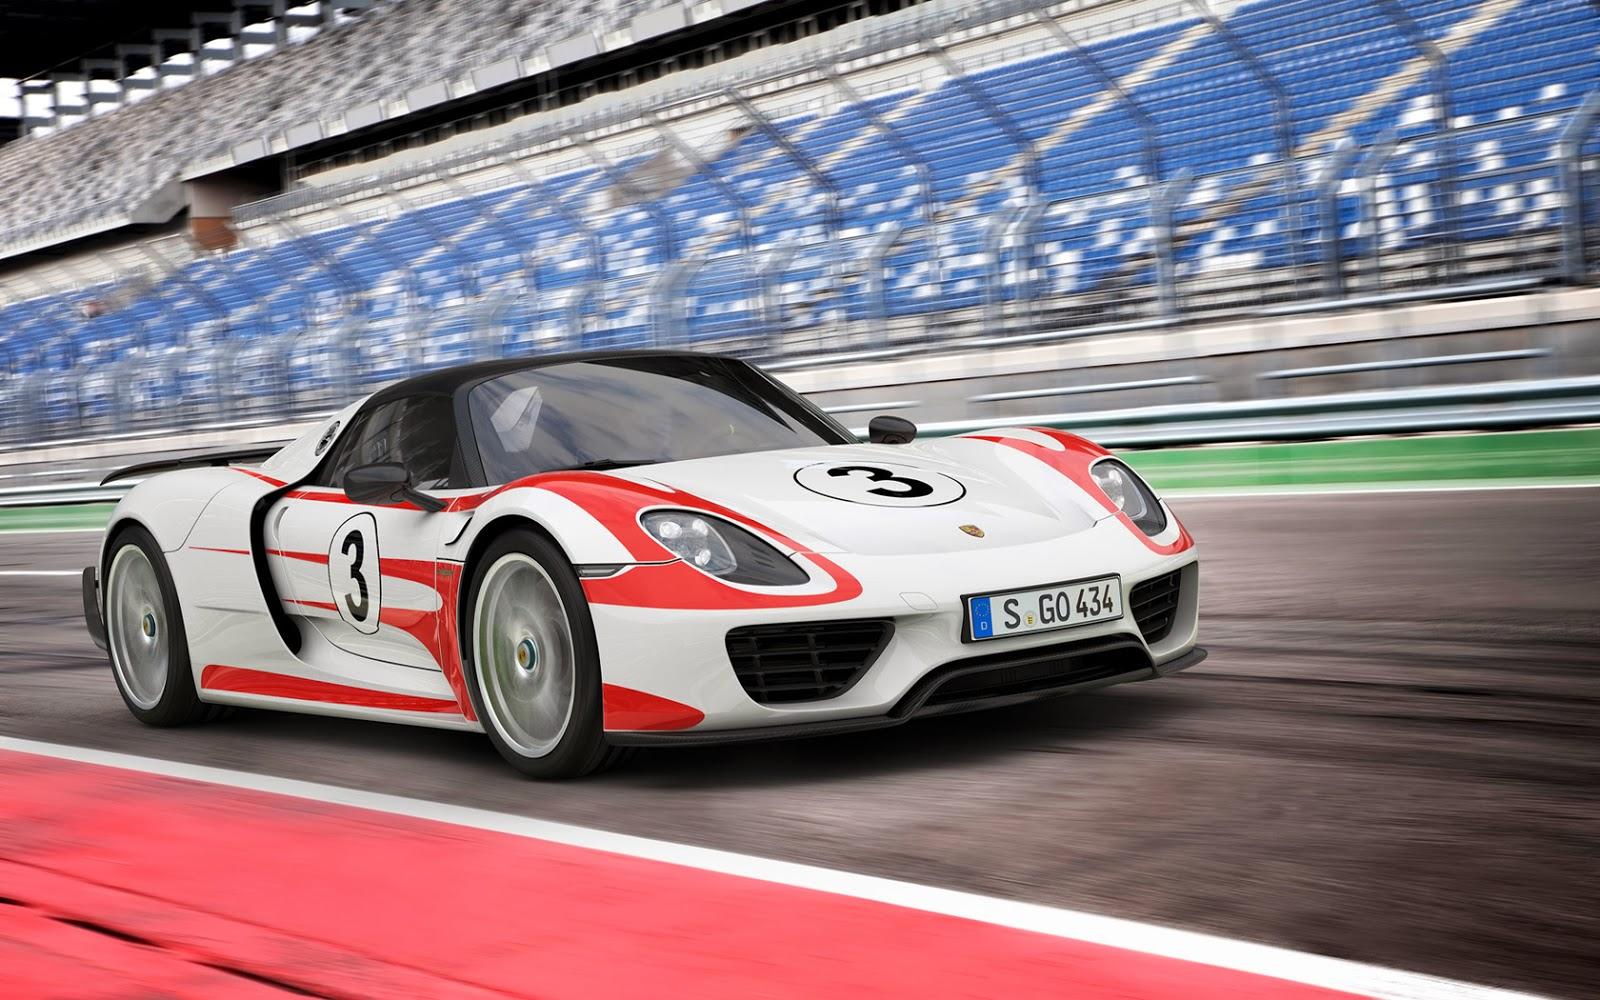 Porsche 918 Spyder Plug In Hybrid Final Tune Drops 0 100km To 2 6 Sec